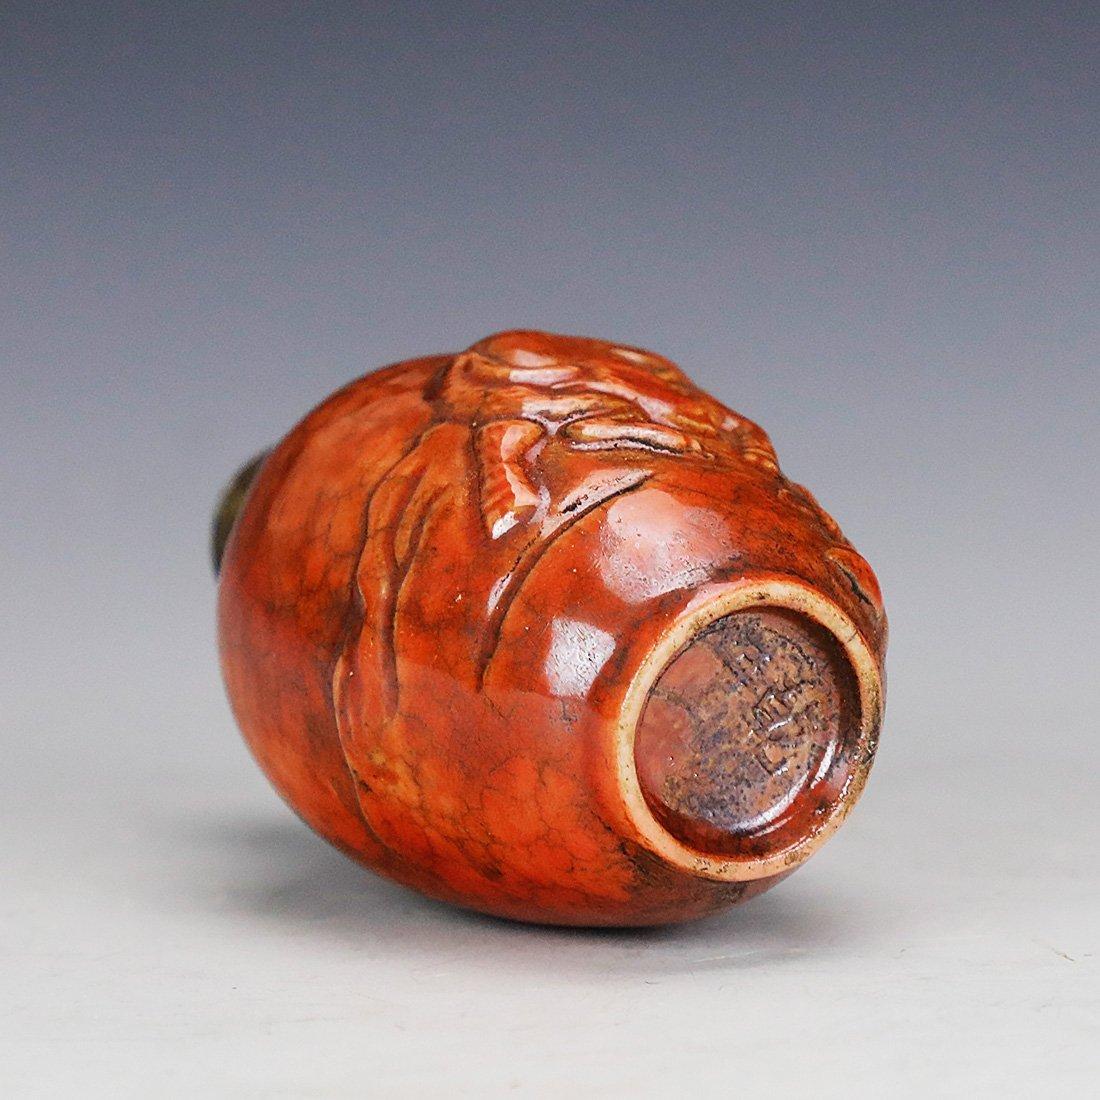 Asia Hand painted ceramic snuff bottle ,18 century - 5